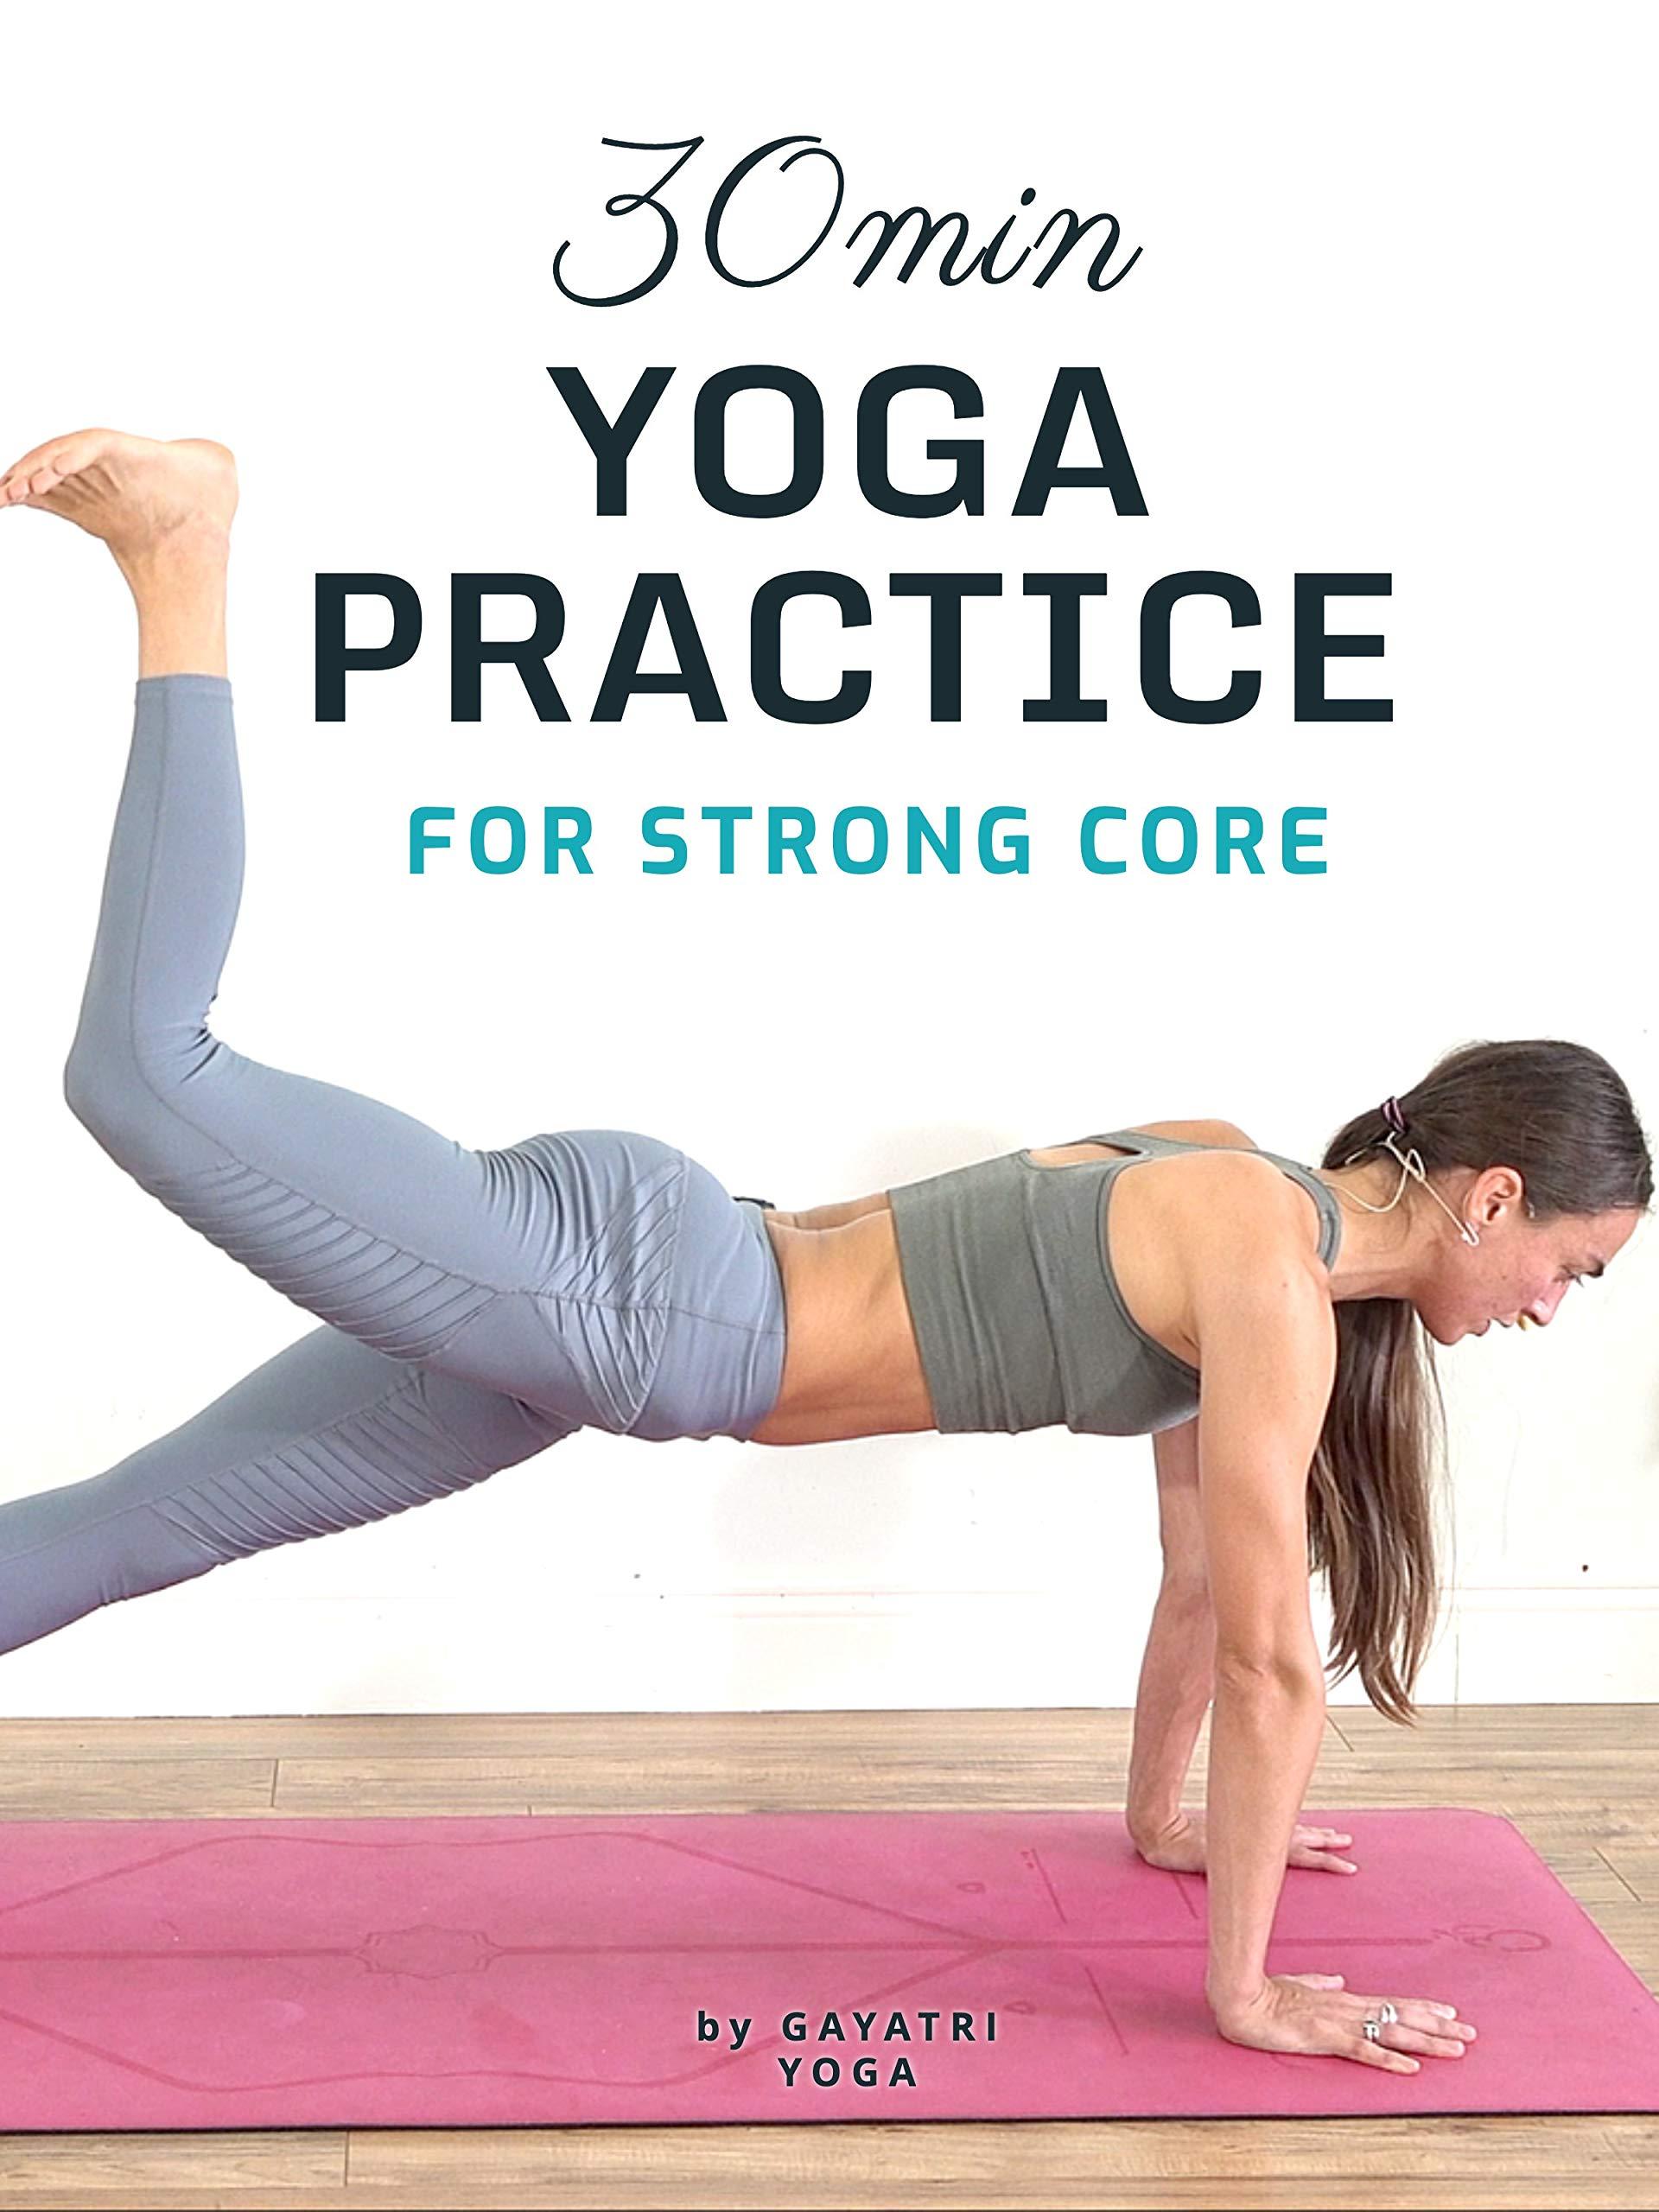 30 Min Yoga Practice For Strong Core - Gayatri Yoga